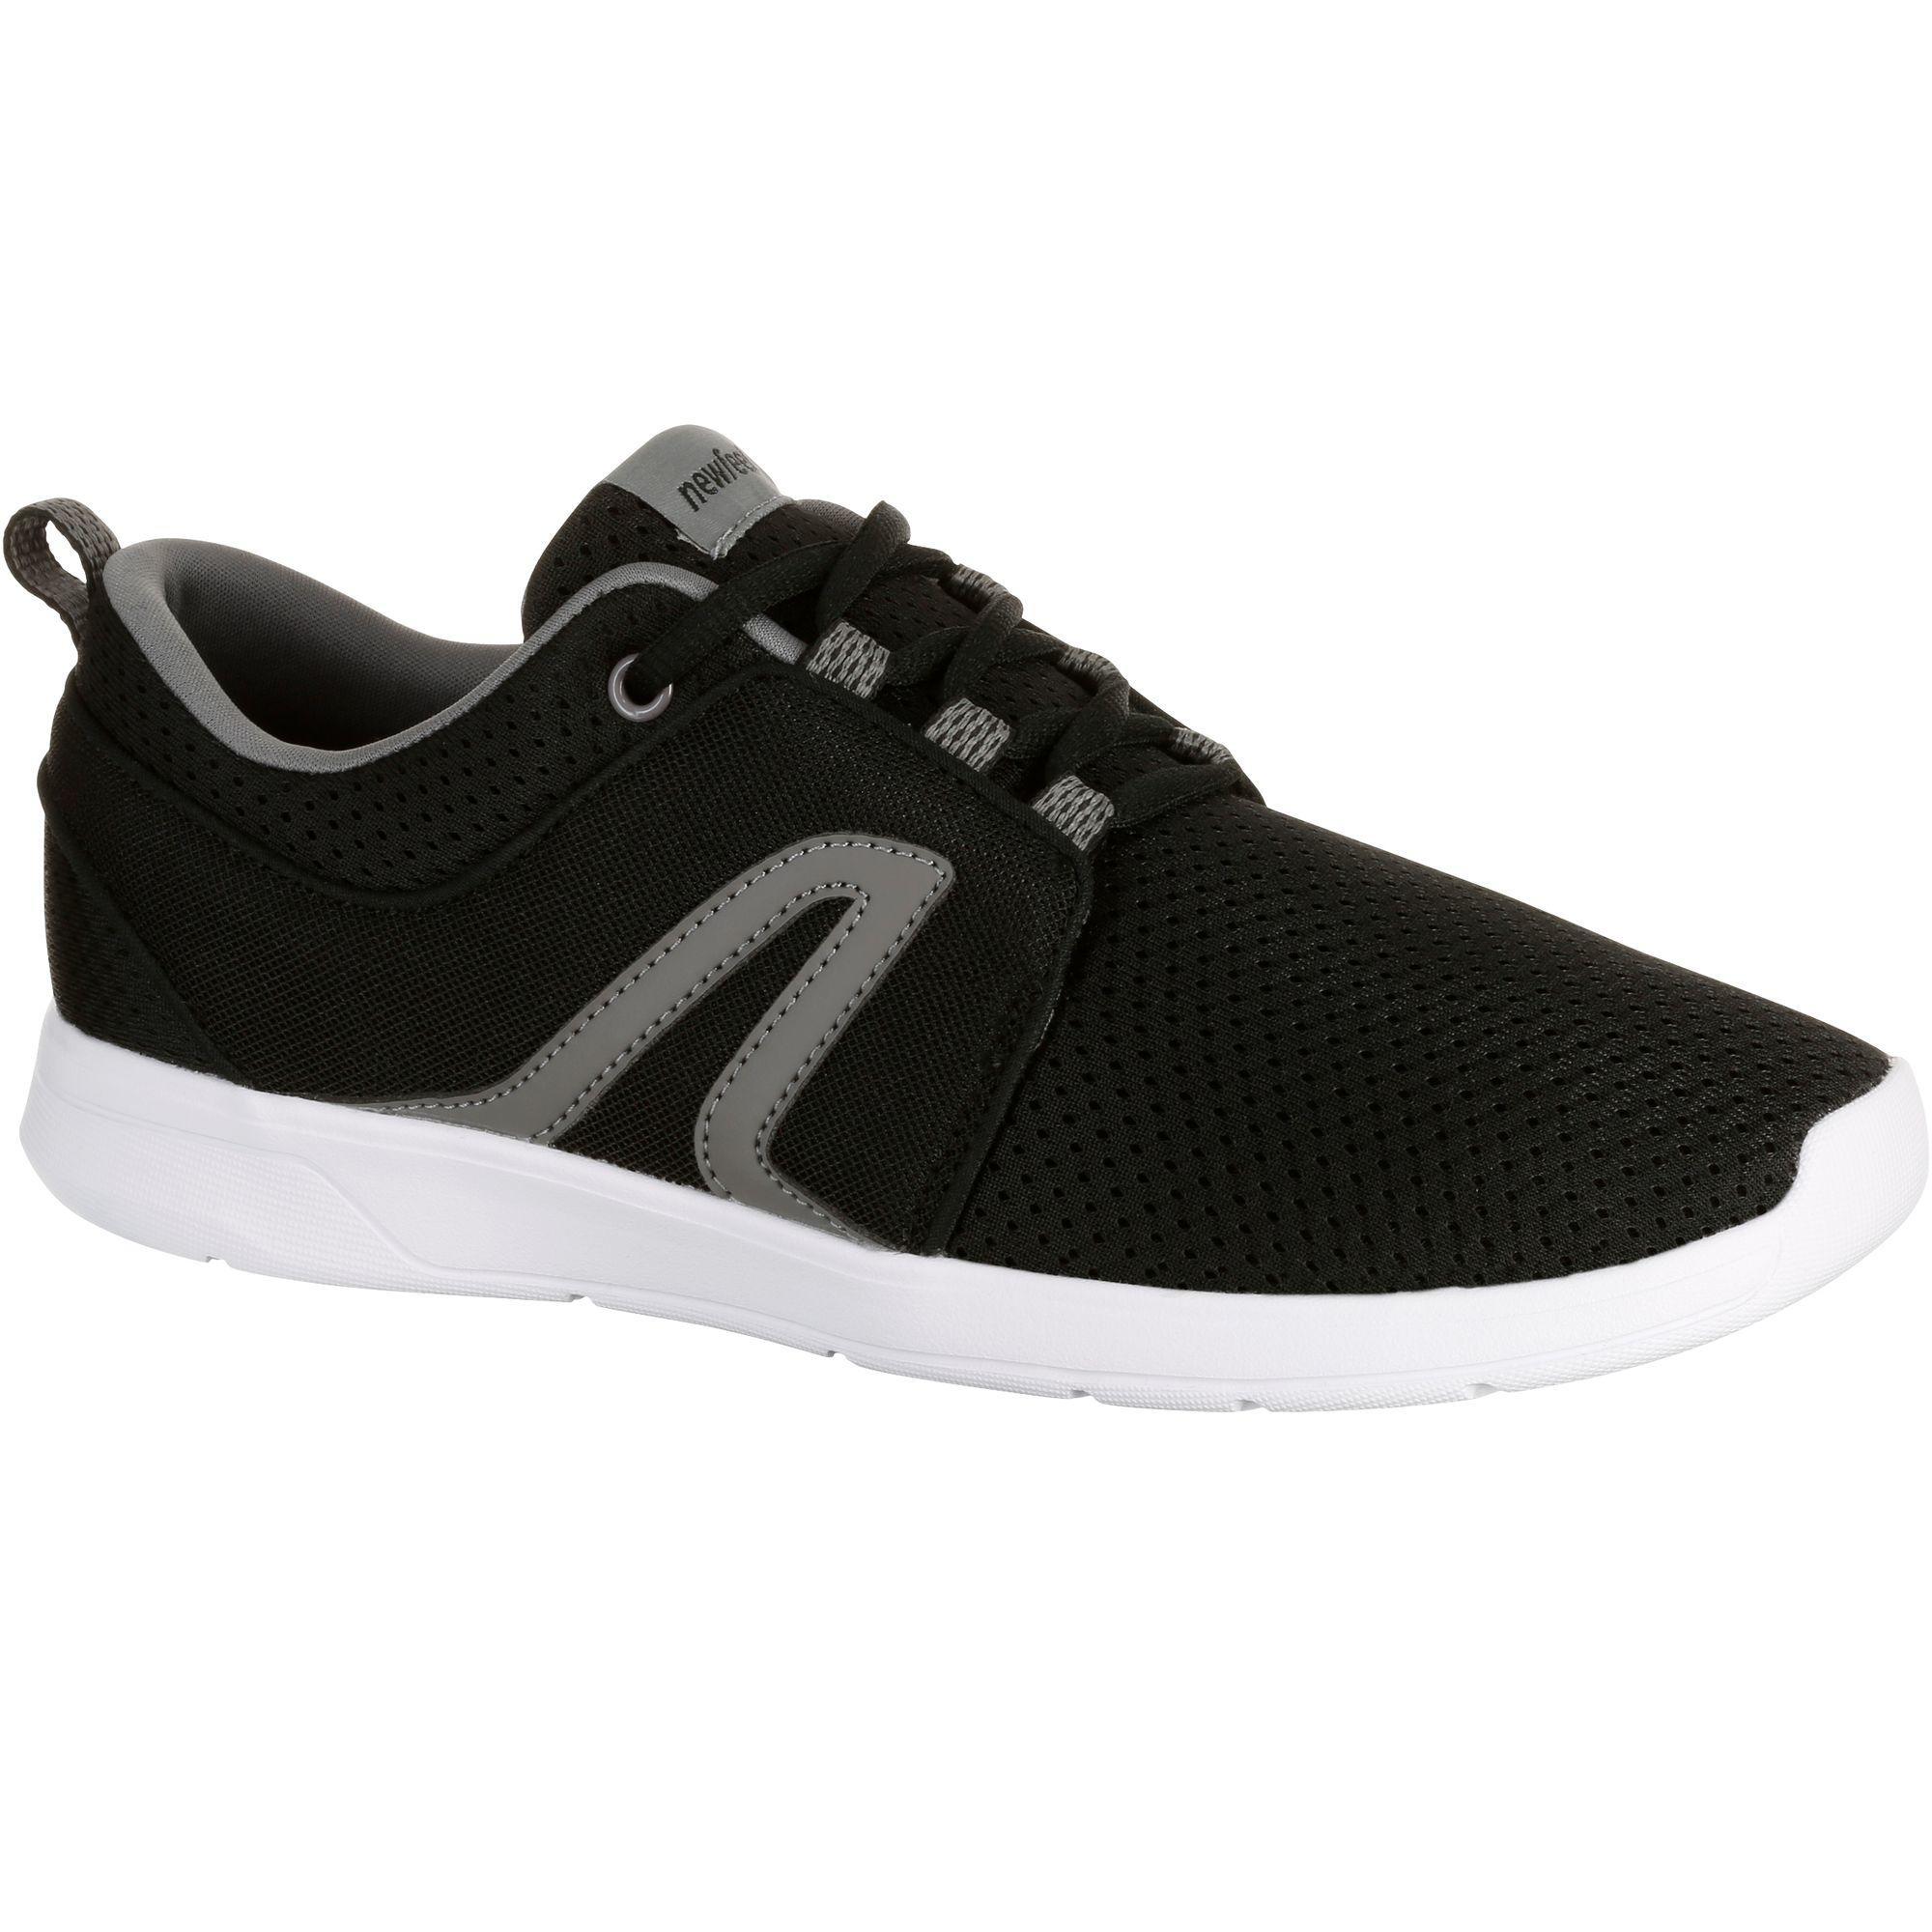 Soft 140 Women's Fitness Walking Shoes - Black